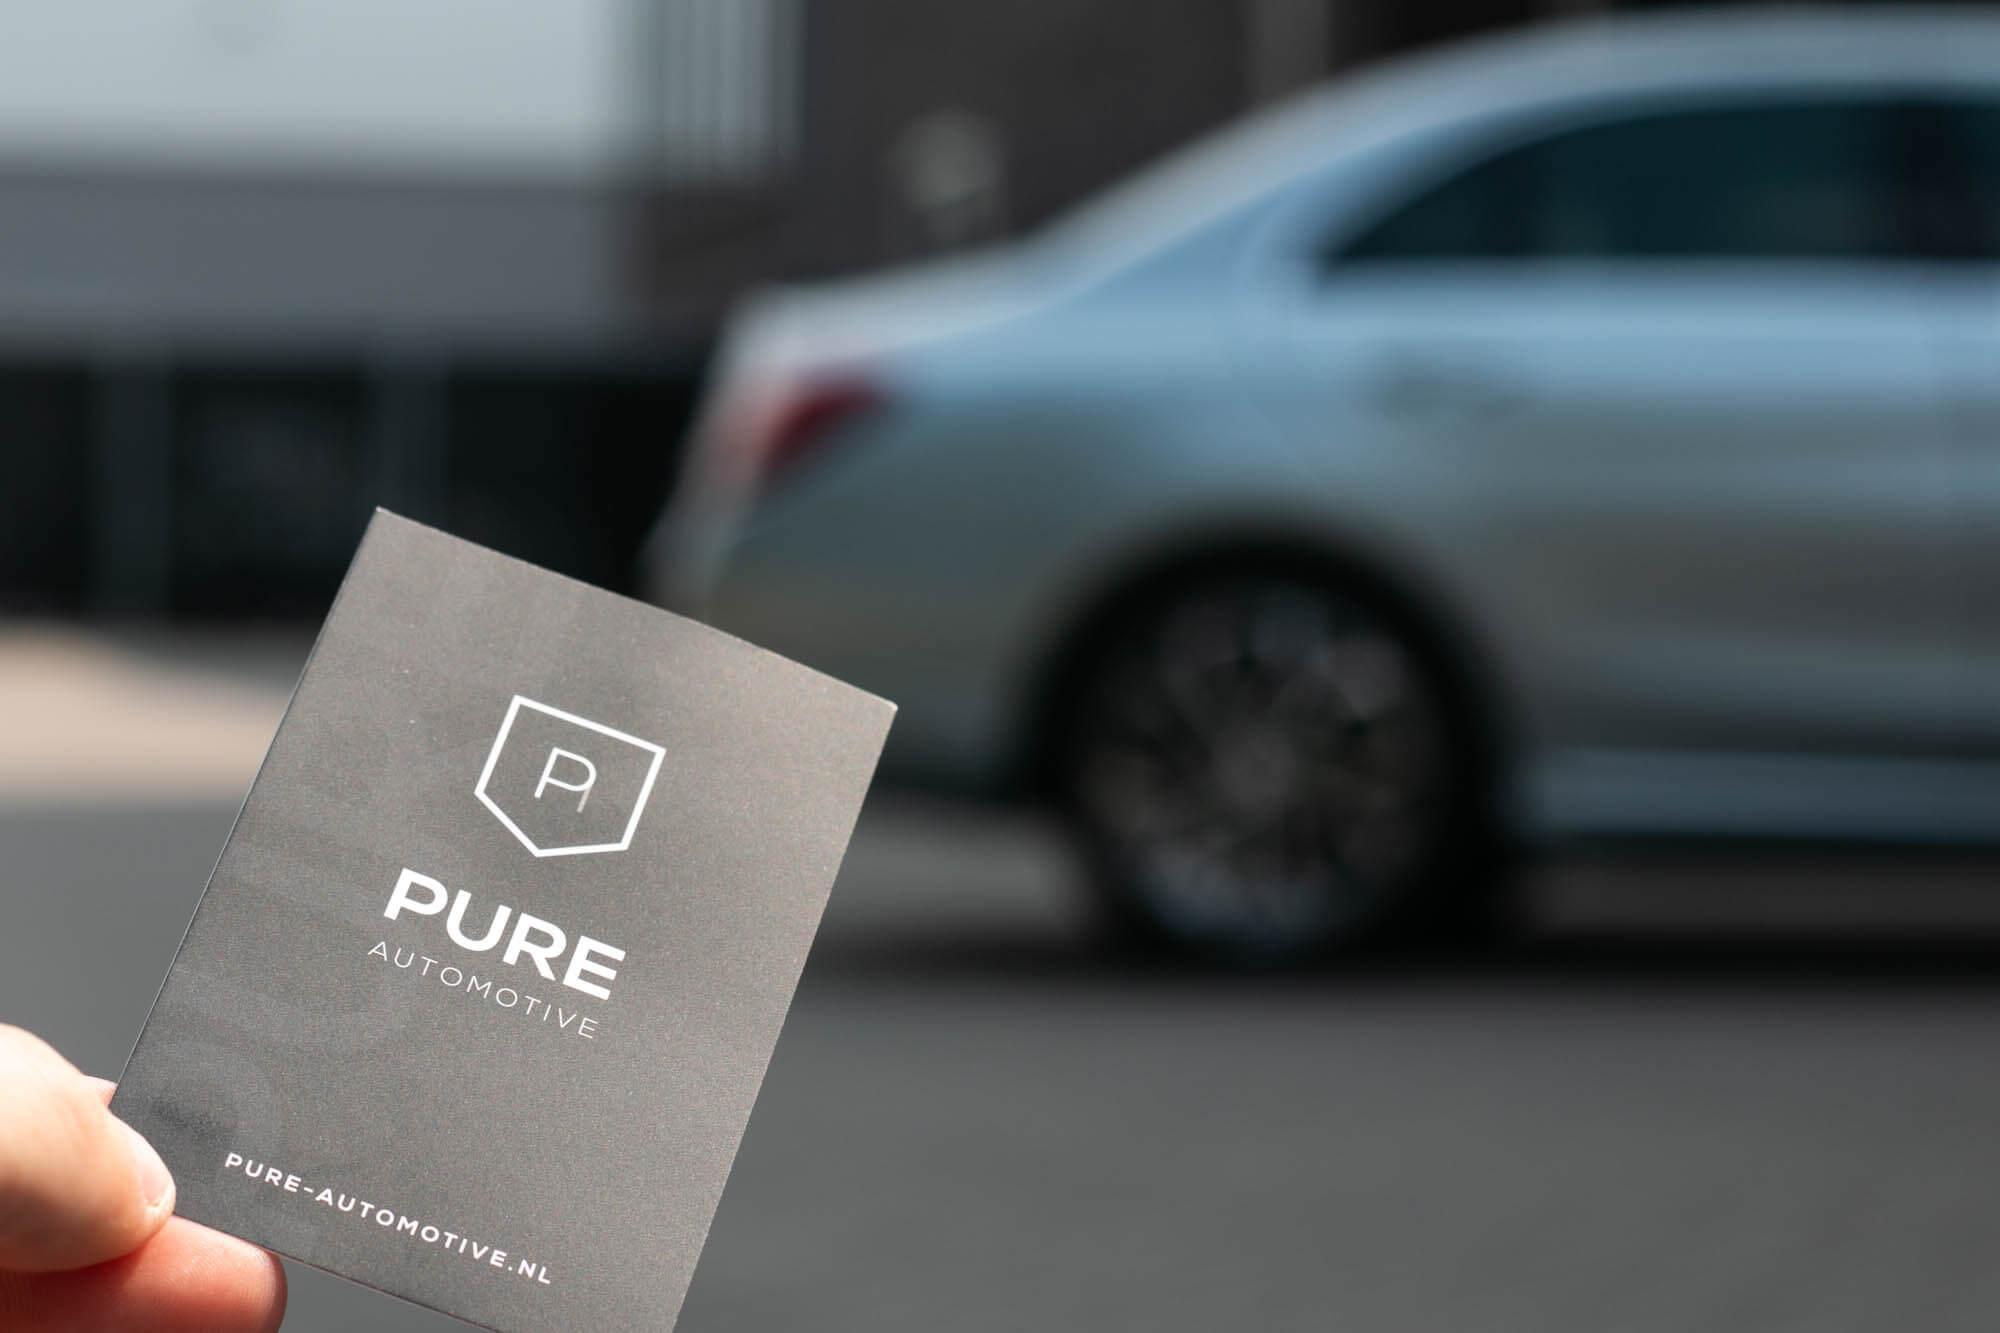 PURE-M-7 kopie